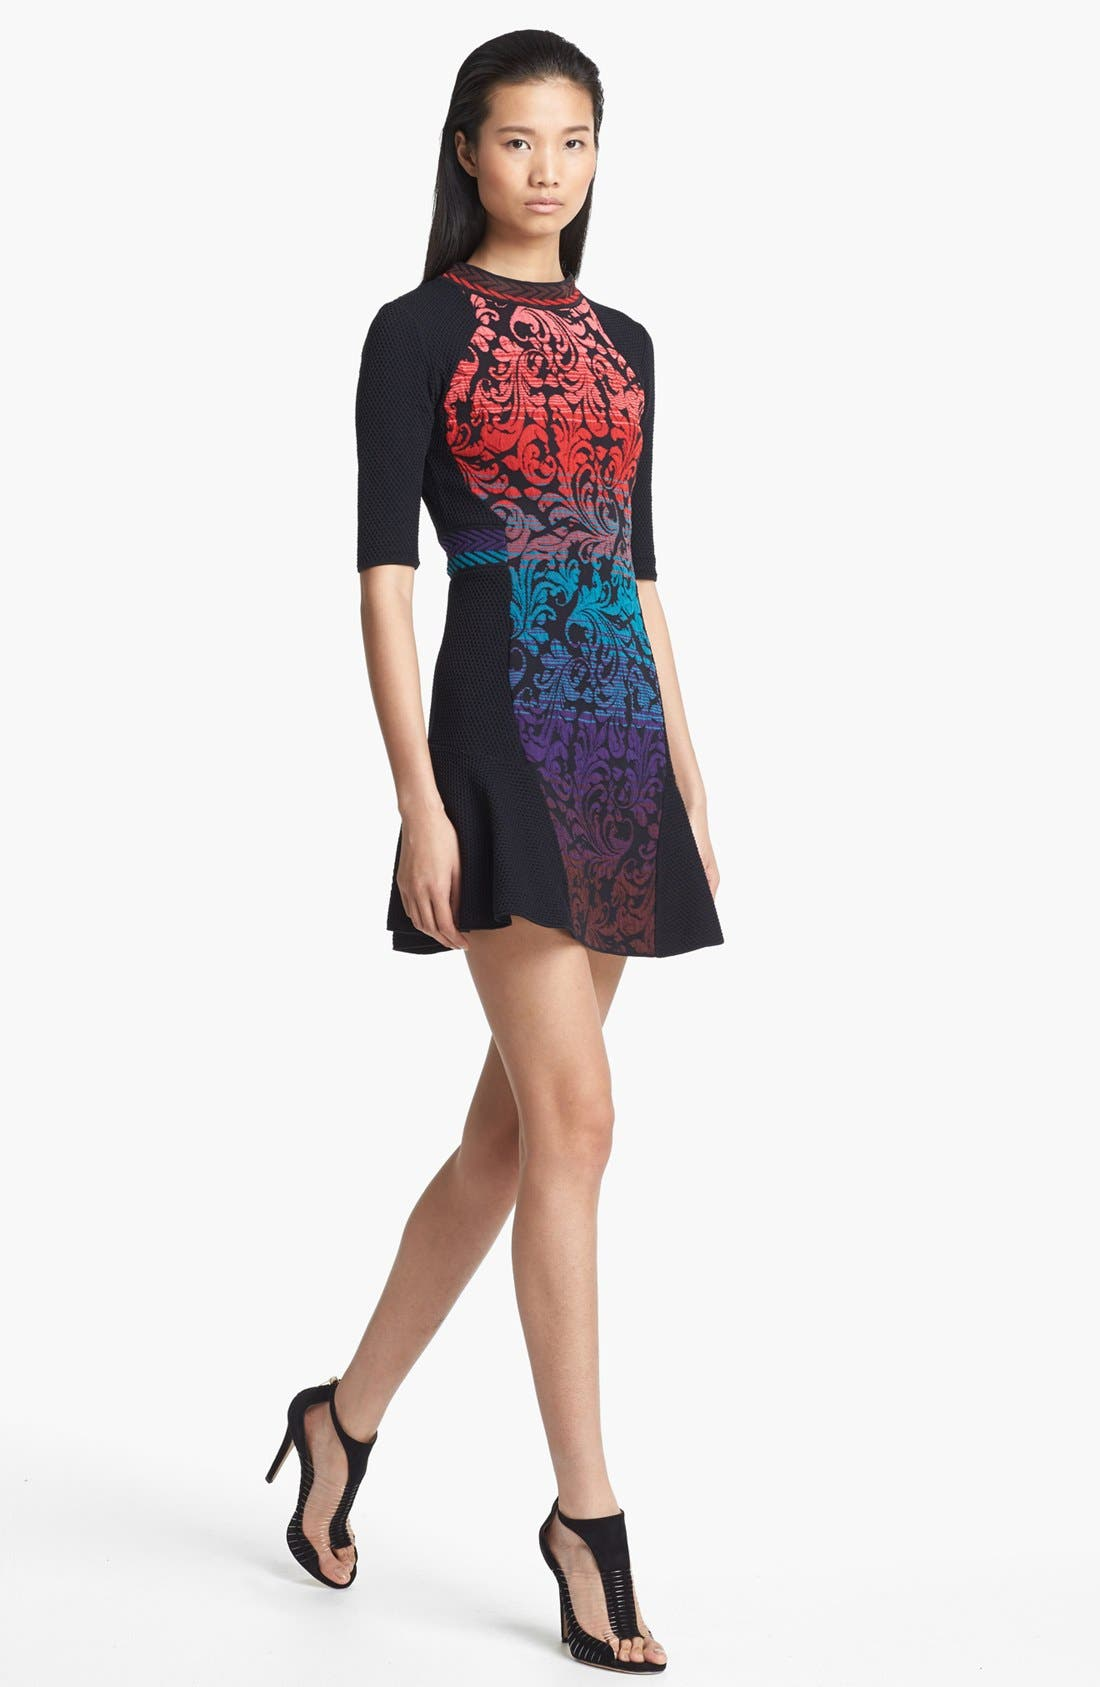 Alternate Image 1 Selected - M Missoni Brocade Intarsia Knit Dress